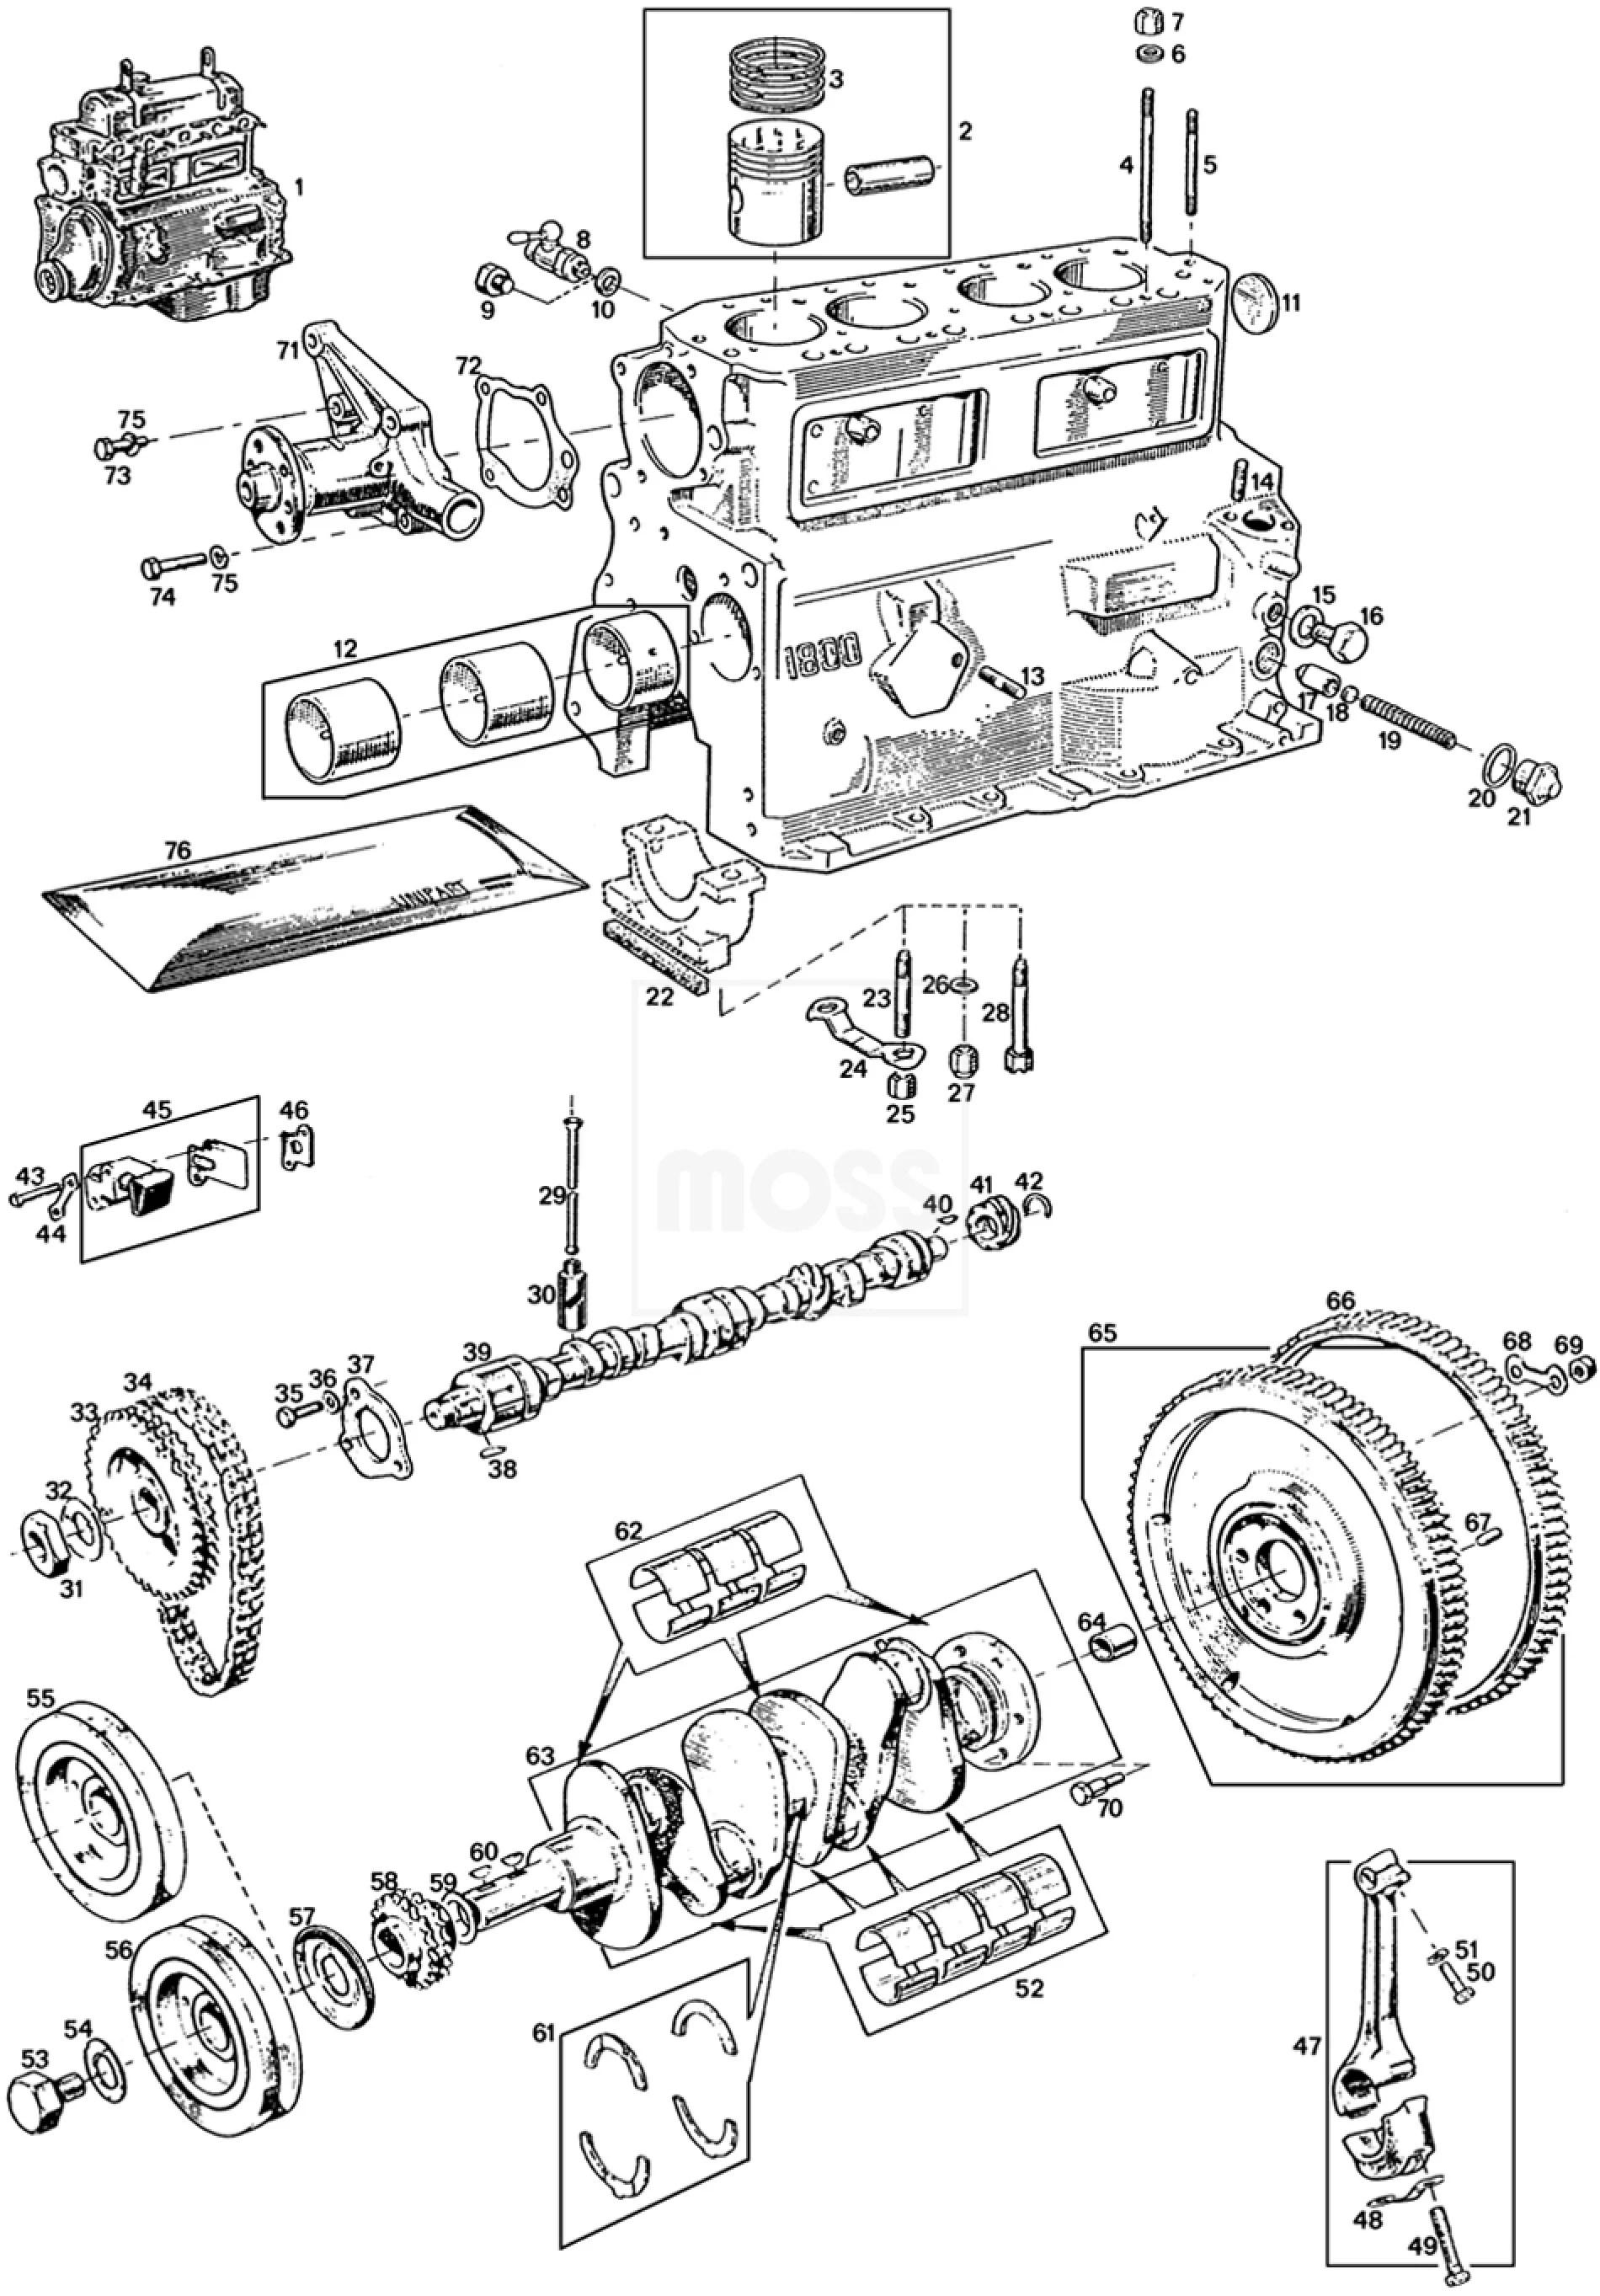 hight resolution of mgb c v8 engine engines components external internal engine 3 main bearing 18g ga mgb